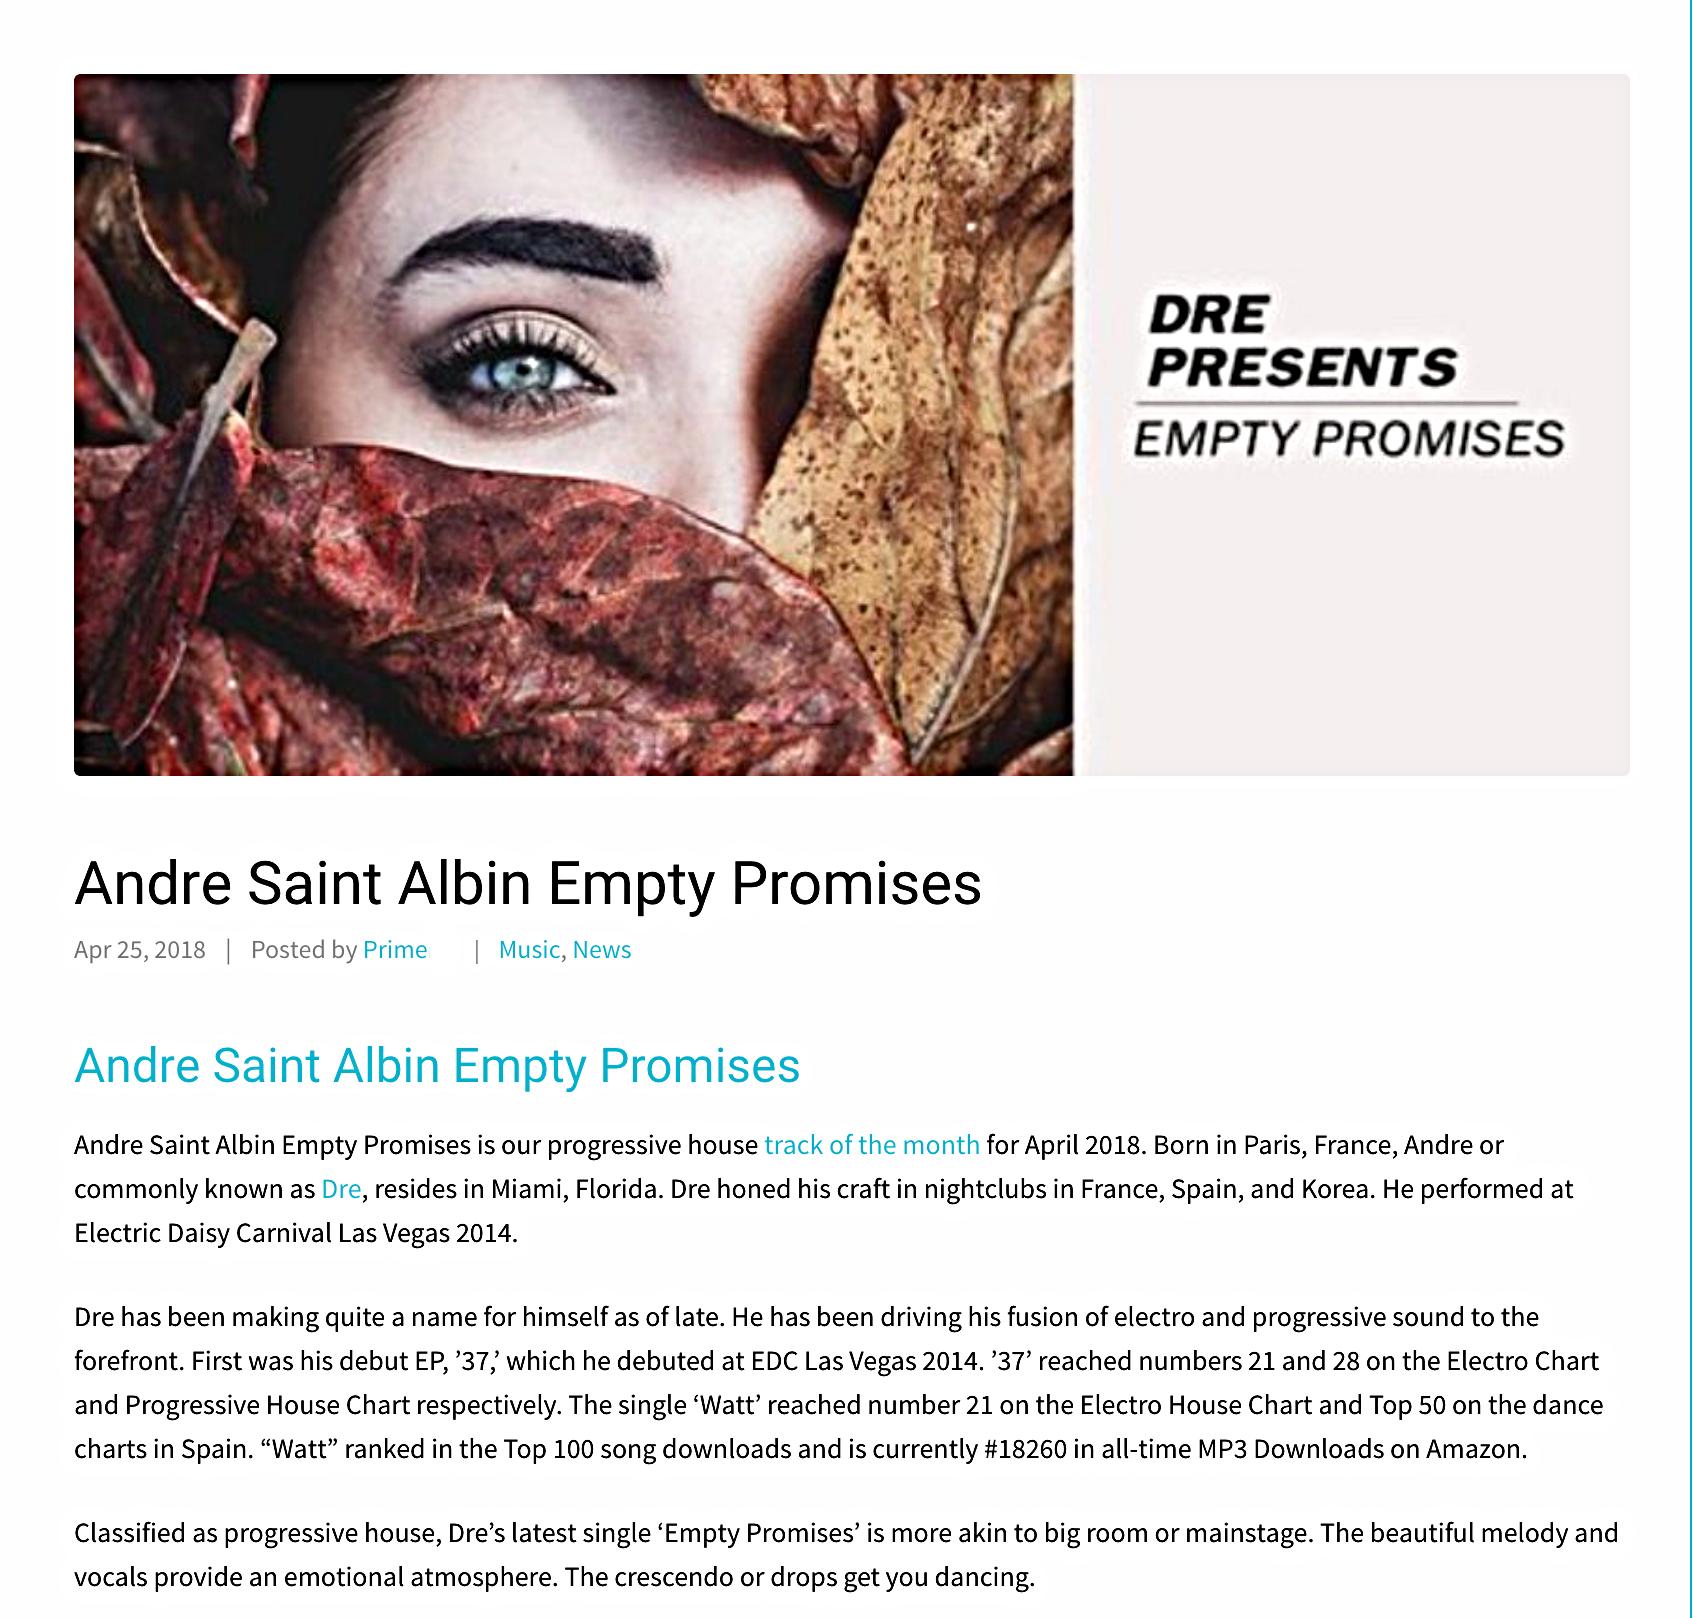 """EMPTY PROMISES"" 2018 SAINT-ALBIN ANDRE"